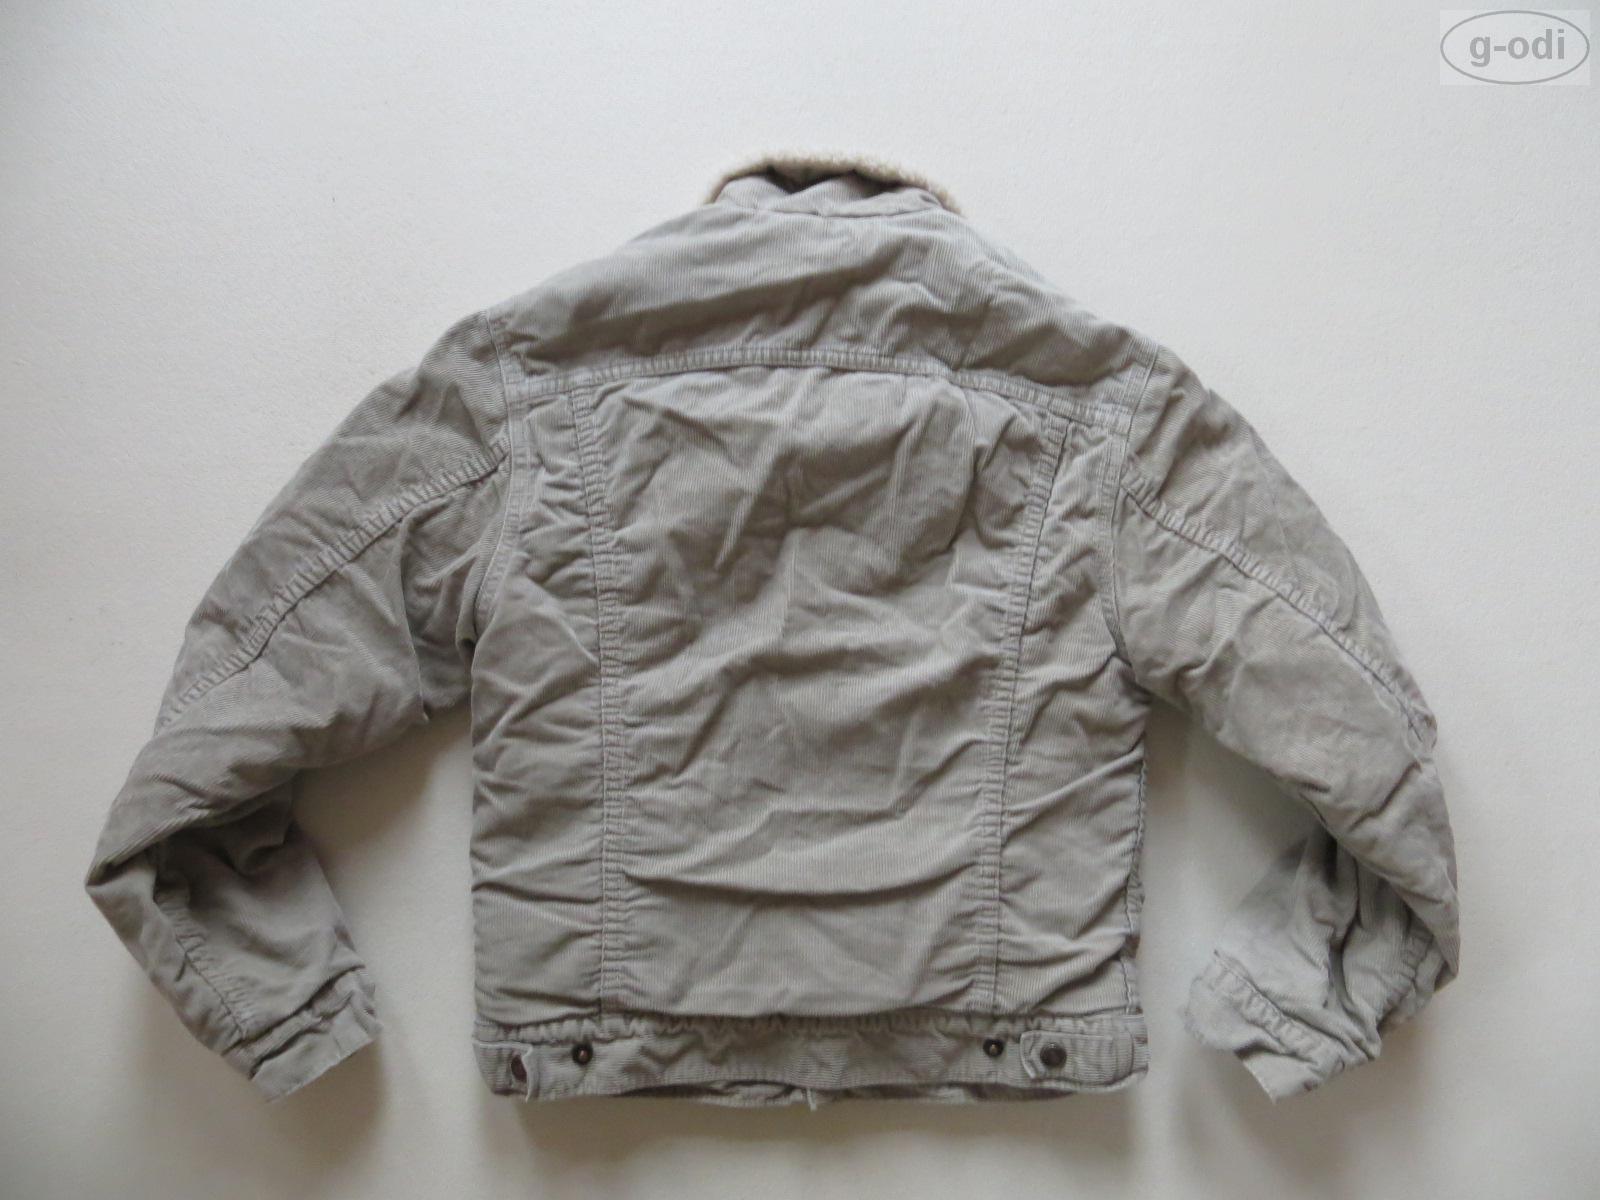 levi 39 s cord jeans jacke mit teddy fell gr xs. Black Bedroom Furniture Sets. Home Design Ideas